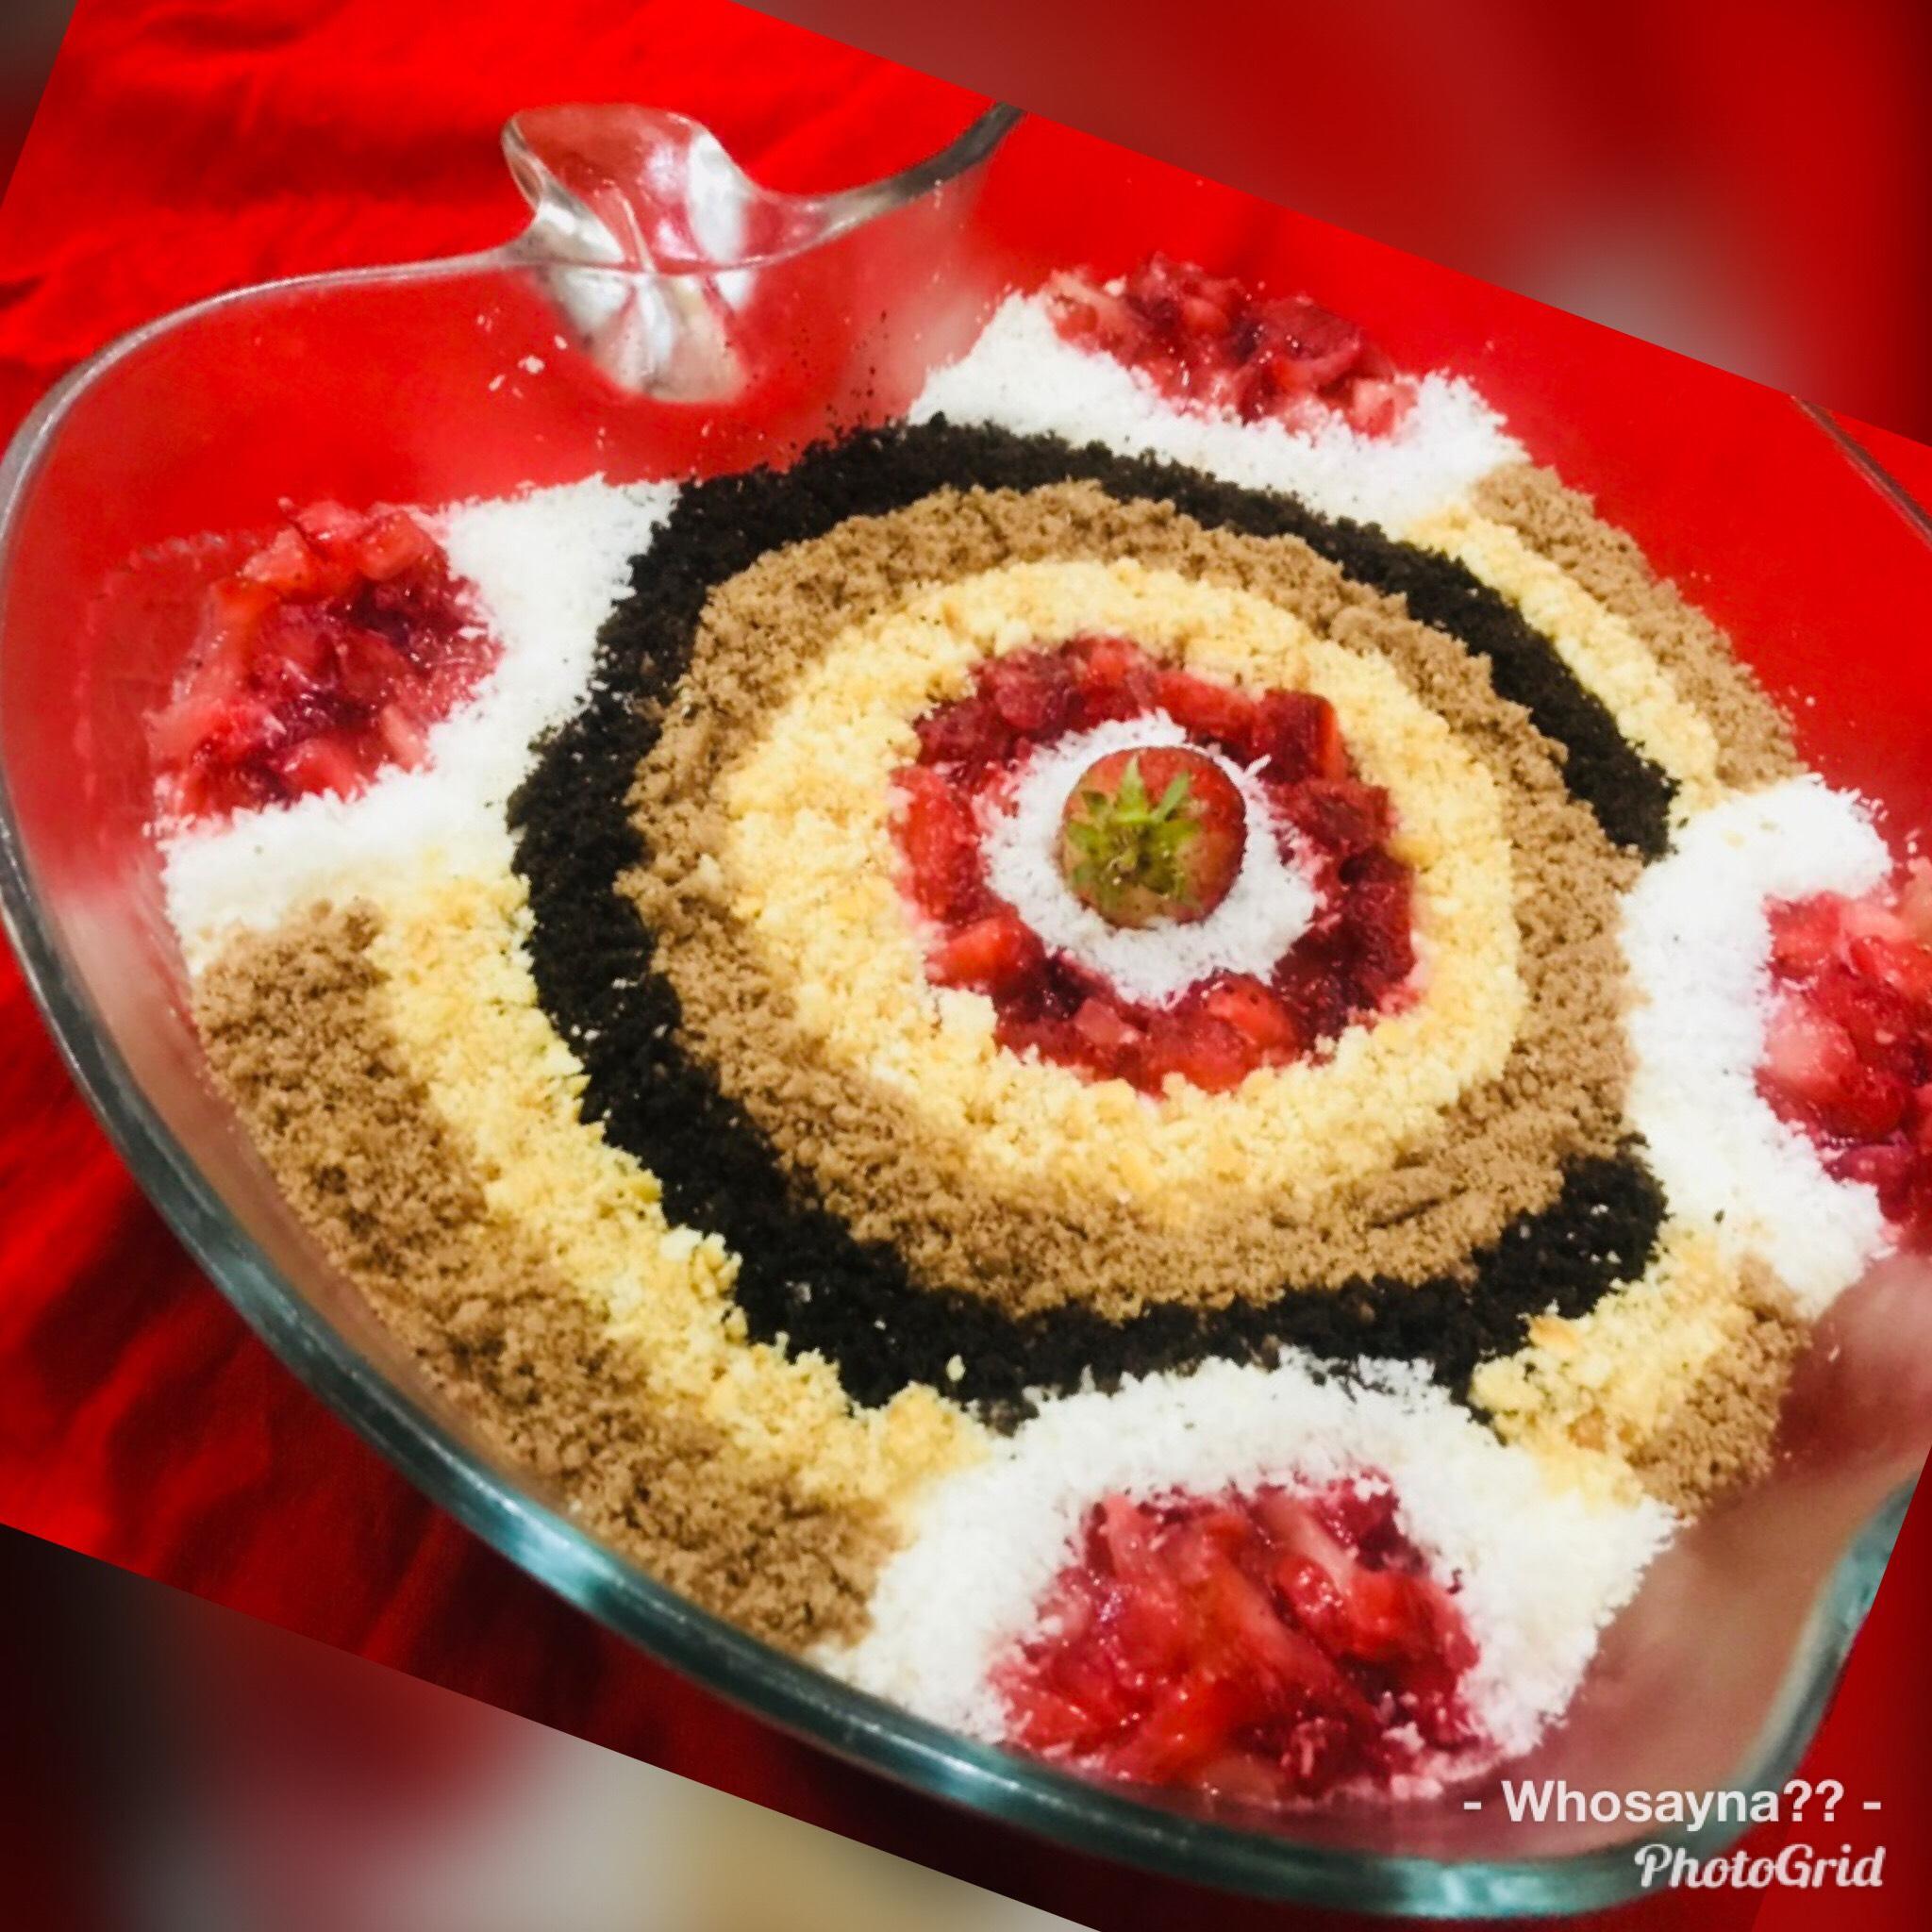 Whosayna's Mocha Choc Mousse Carpet Pudding